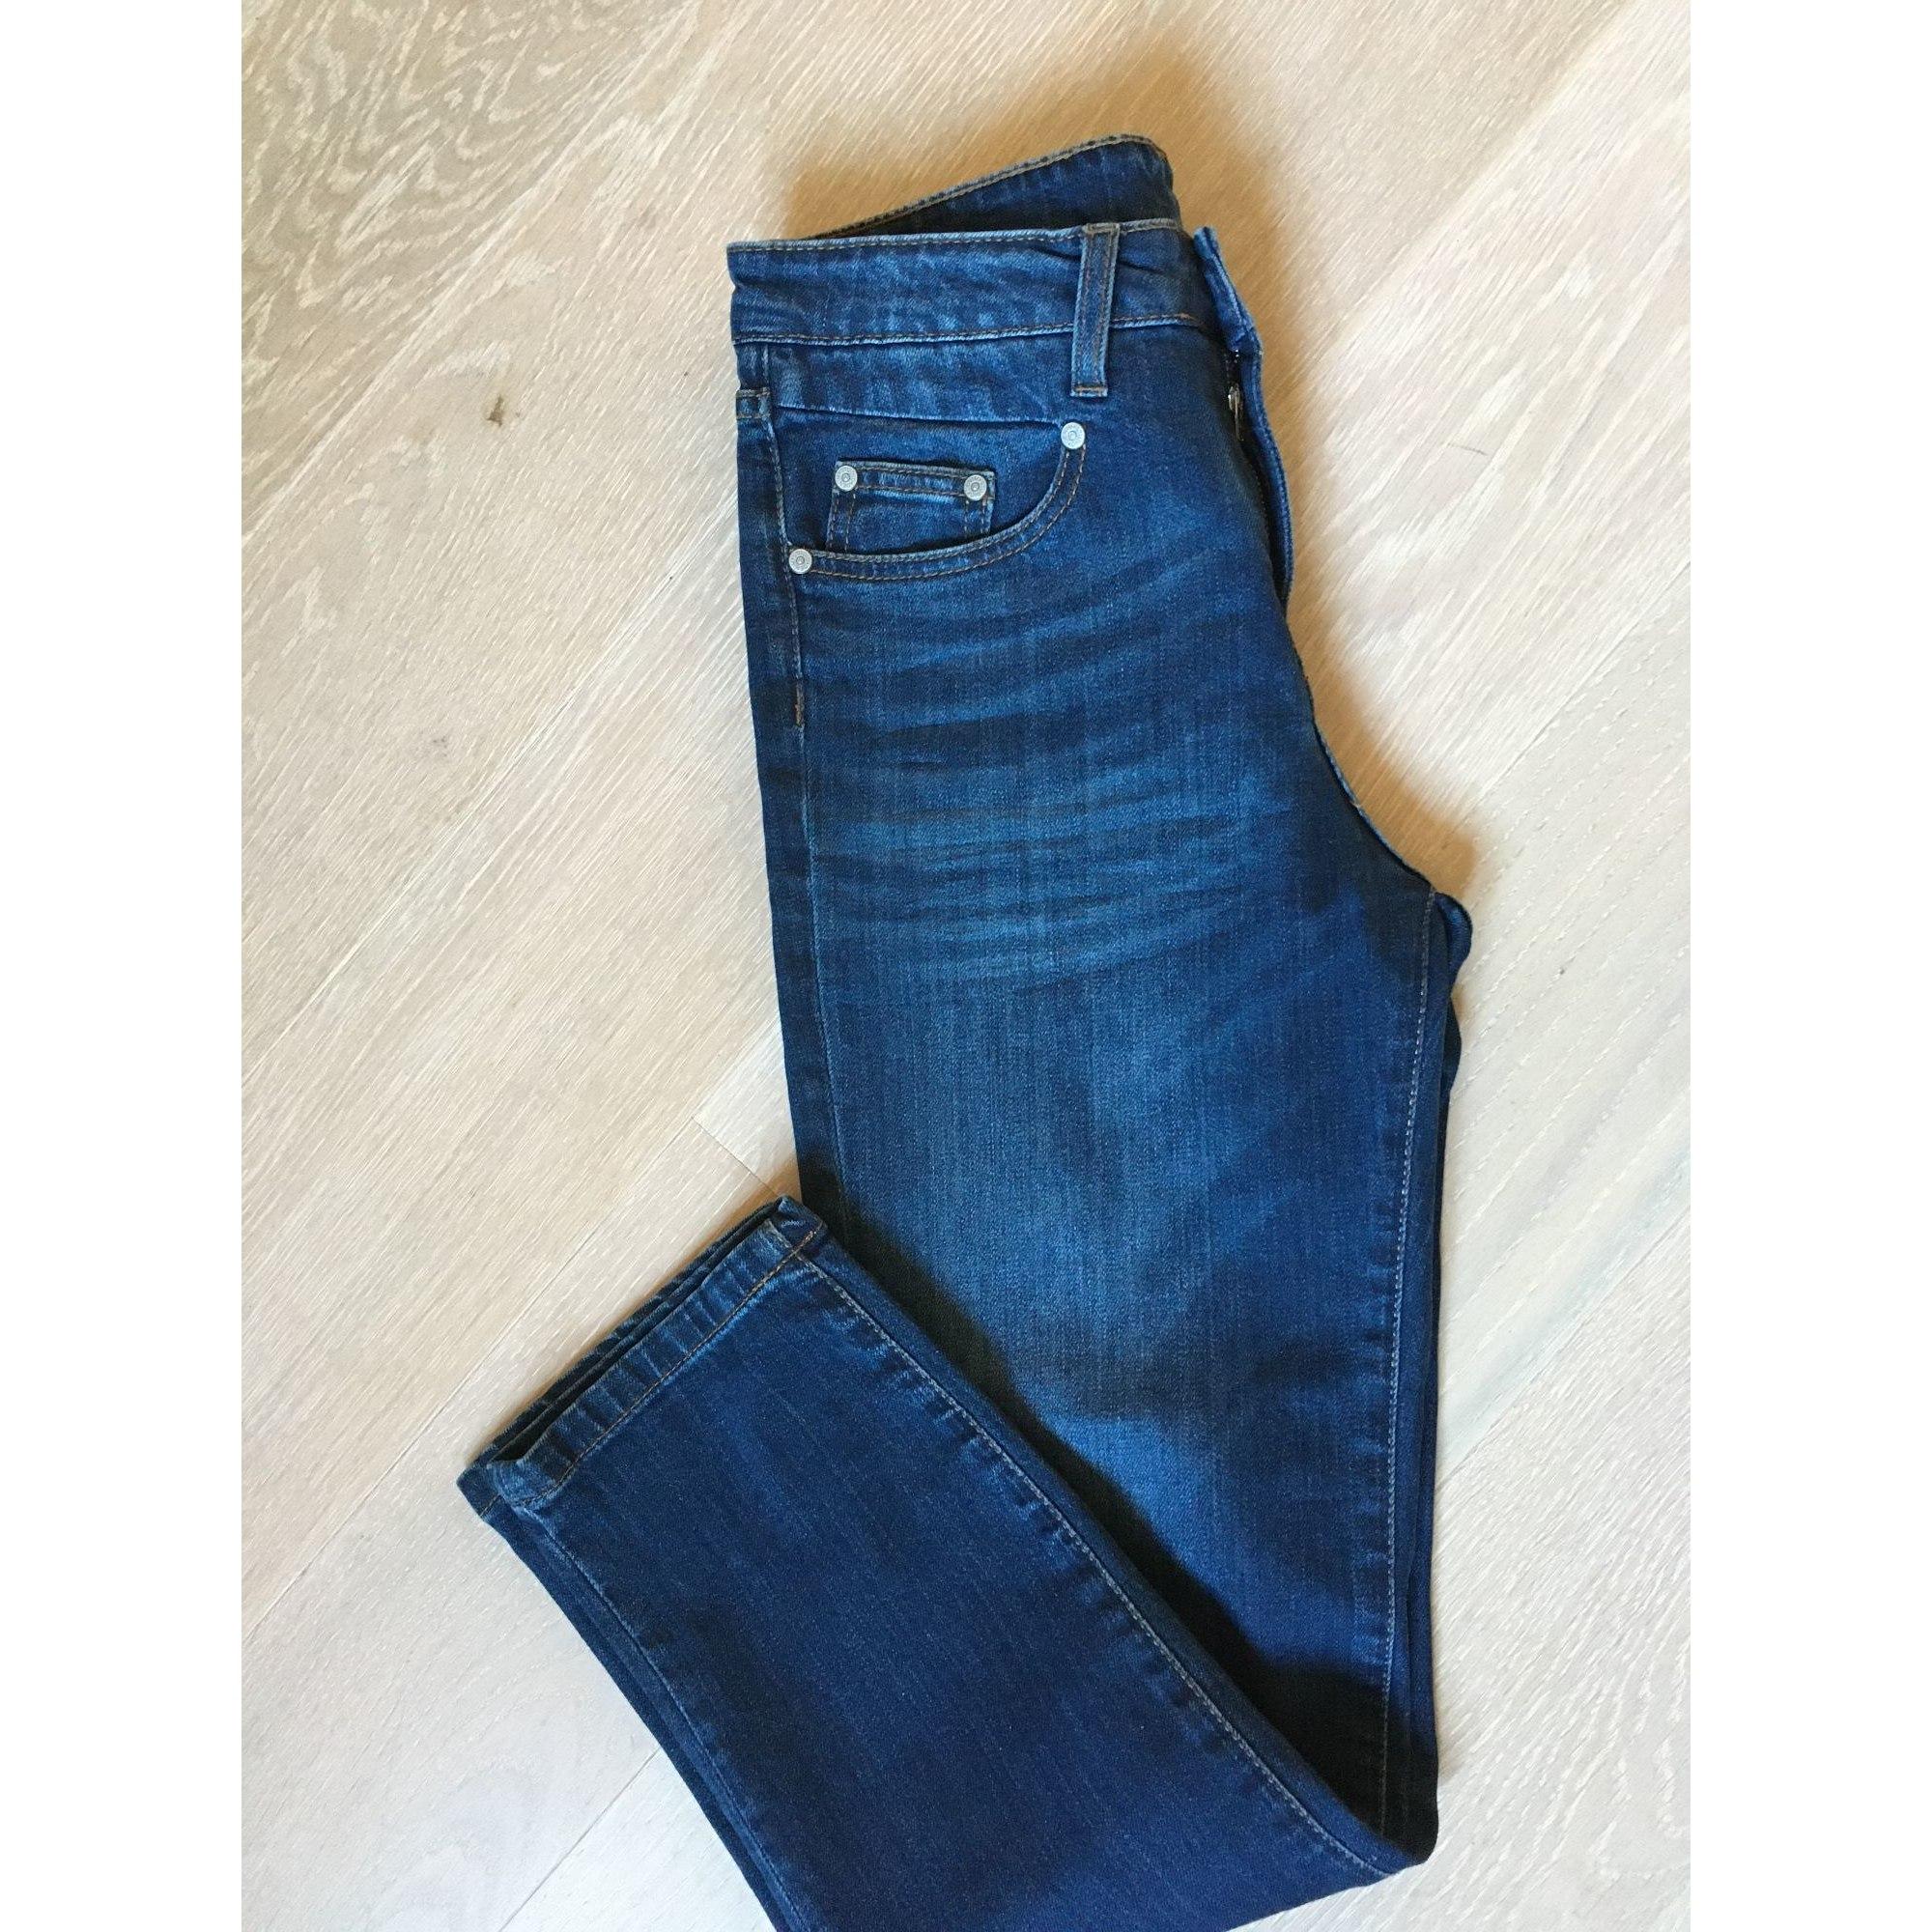 Jeans droit DENIM STUDIO Bleu, bleu marine, bleu turquoise